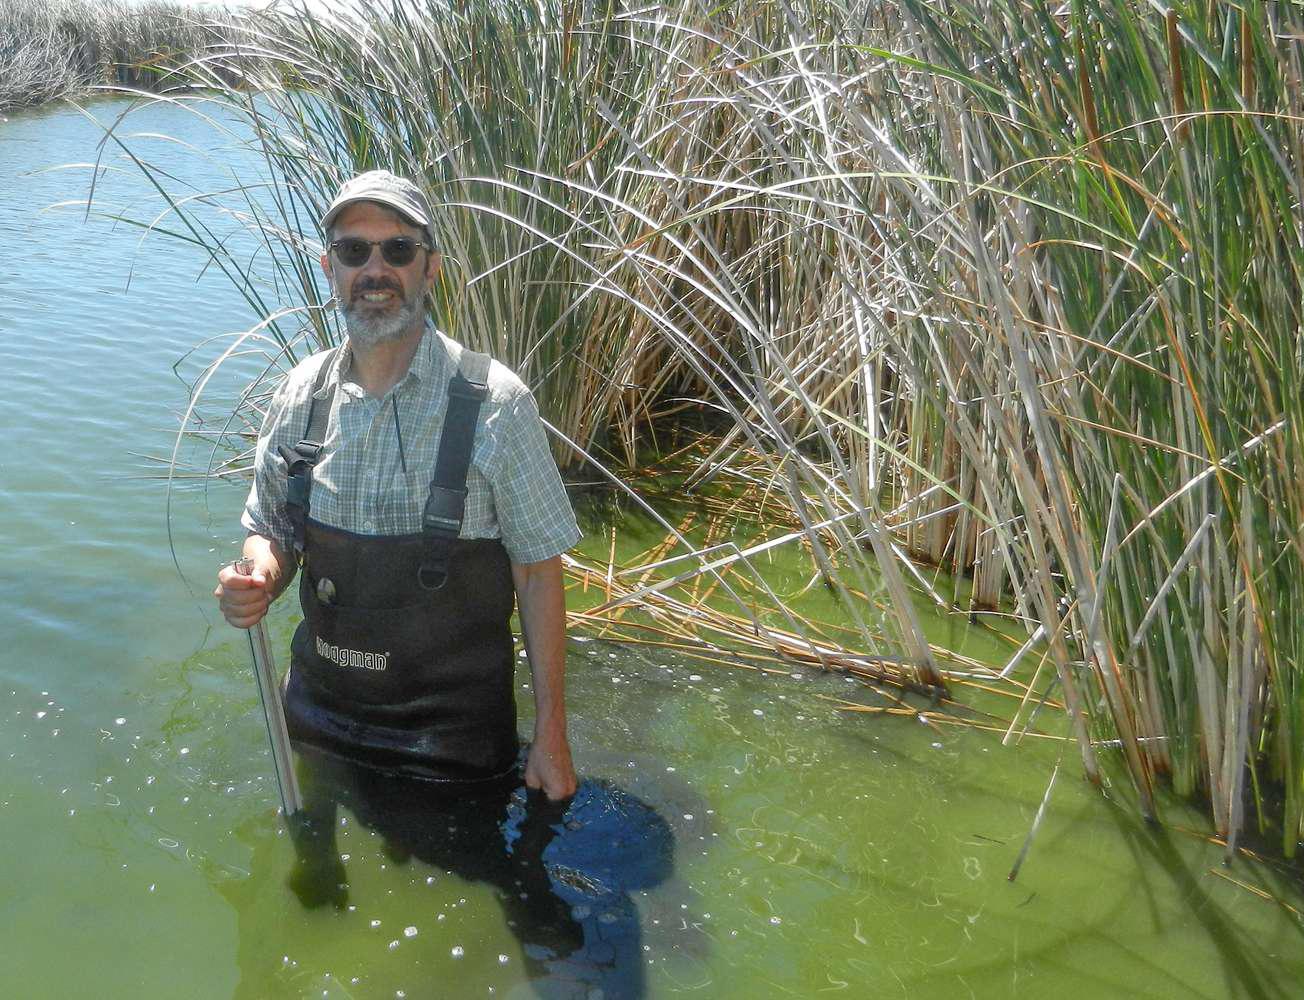 Dennis Baldocchi wades through a restored wetland at a research site in the Sacramento-San Joaquin River Delta.